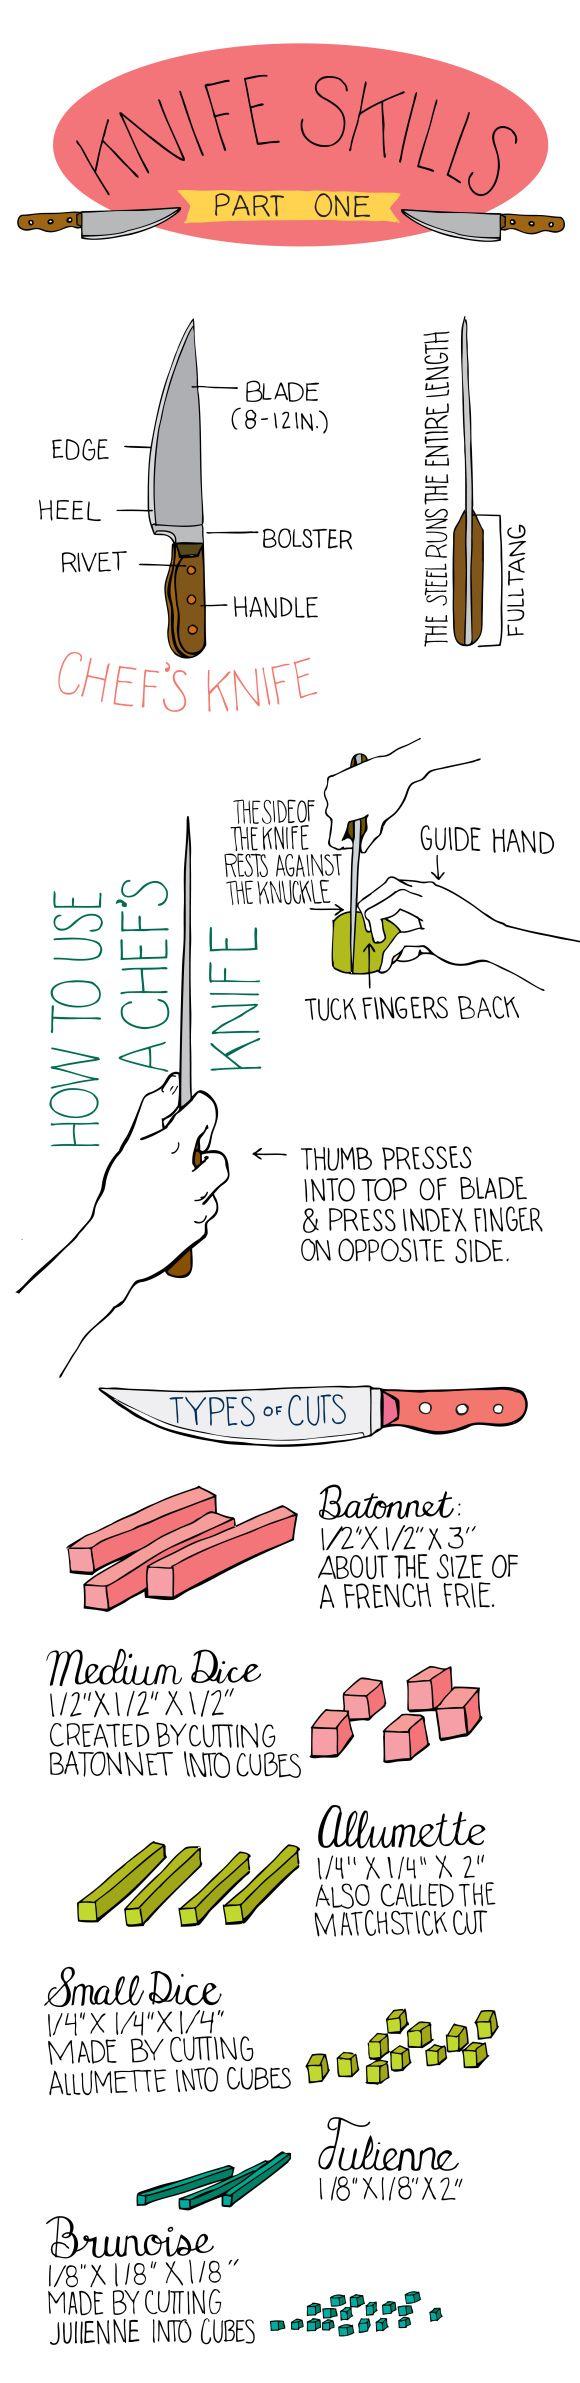 Culinary Arts | Illustrated Bites